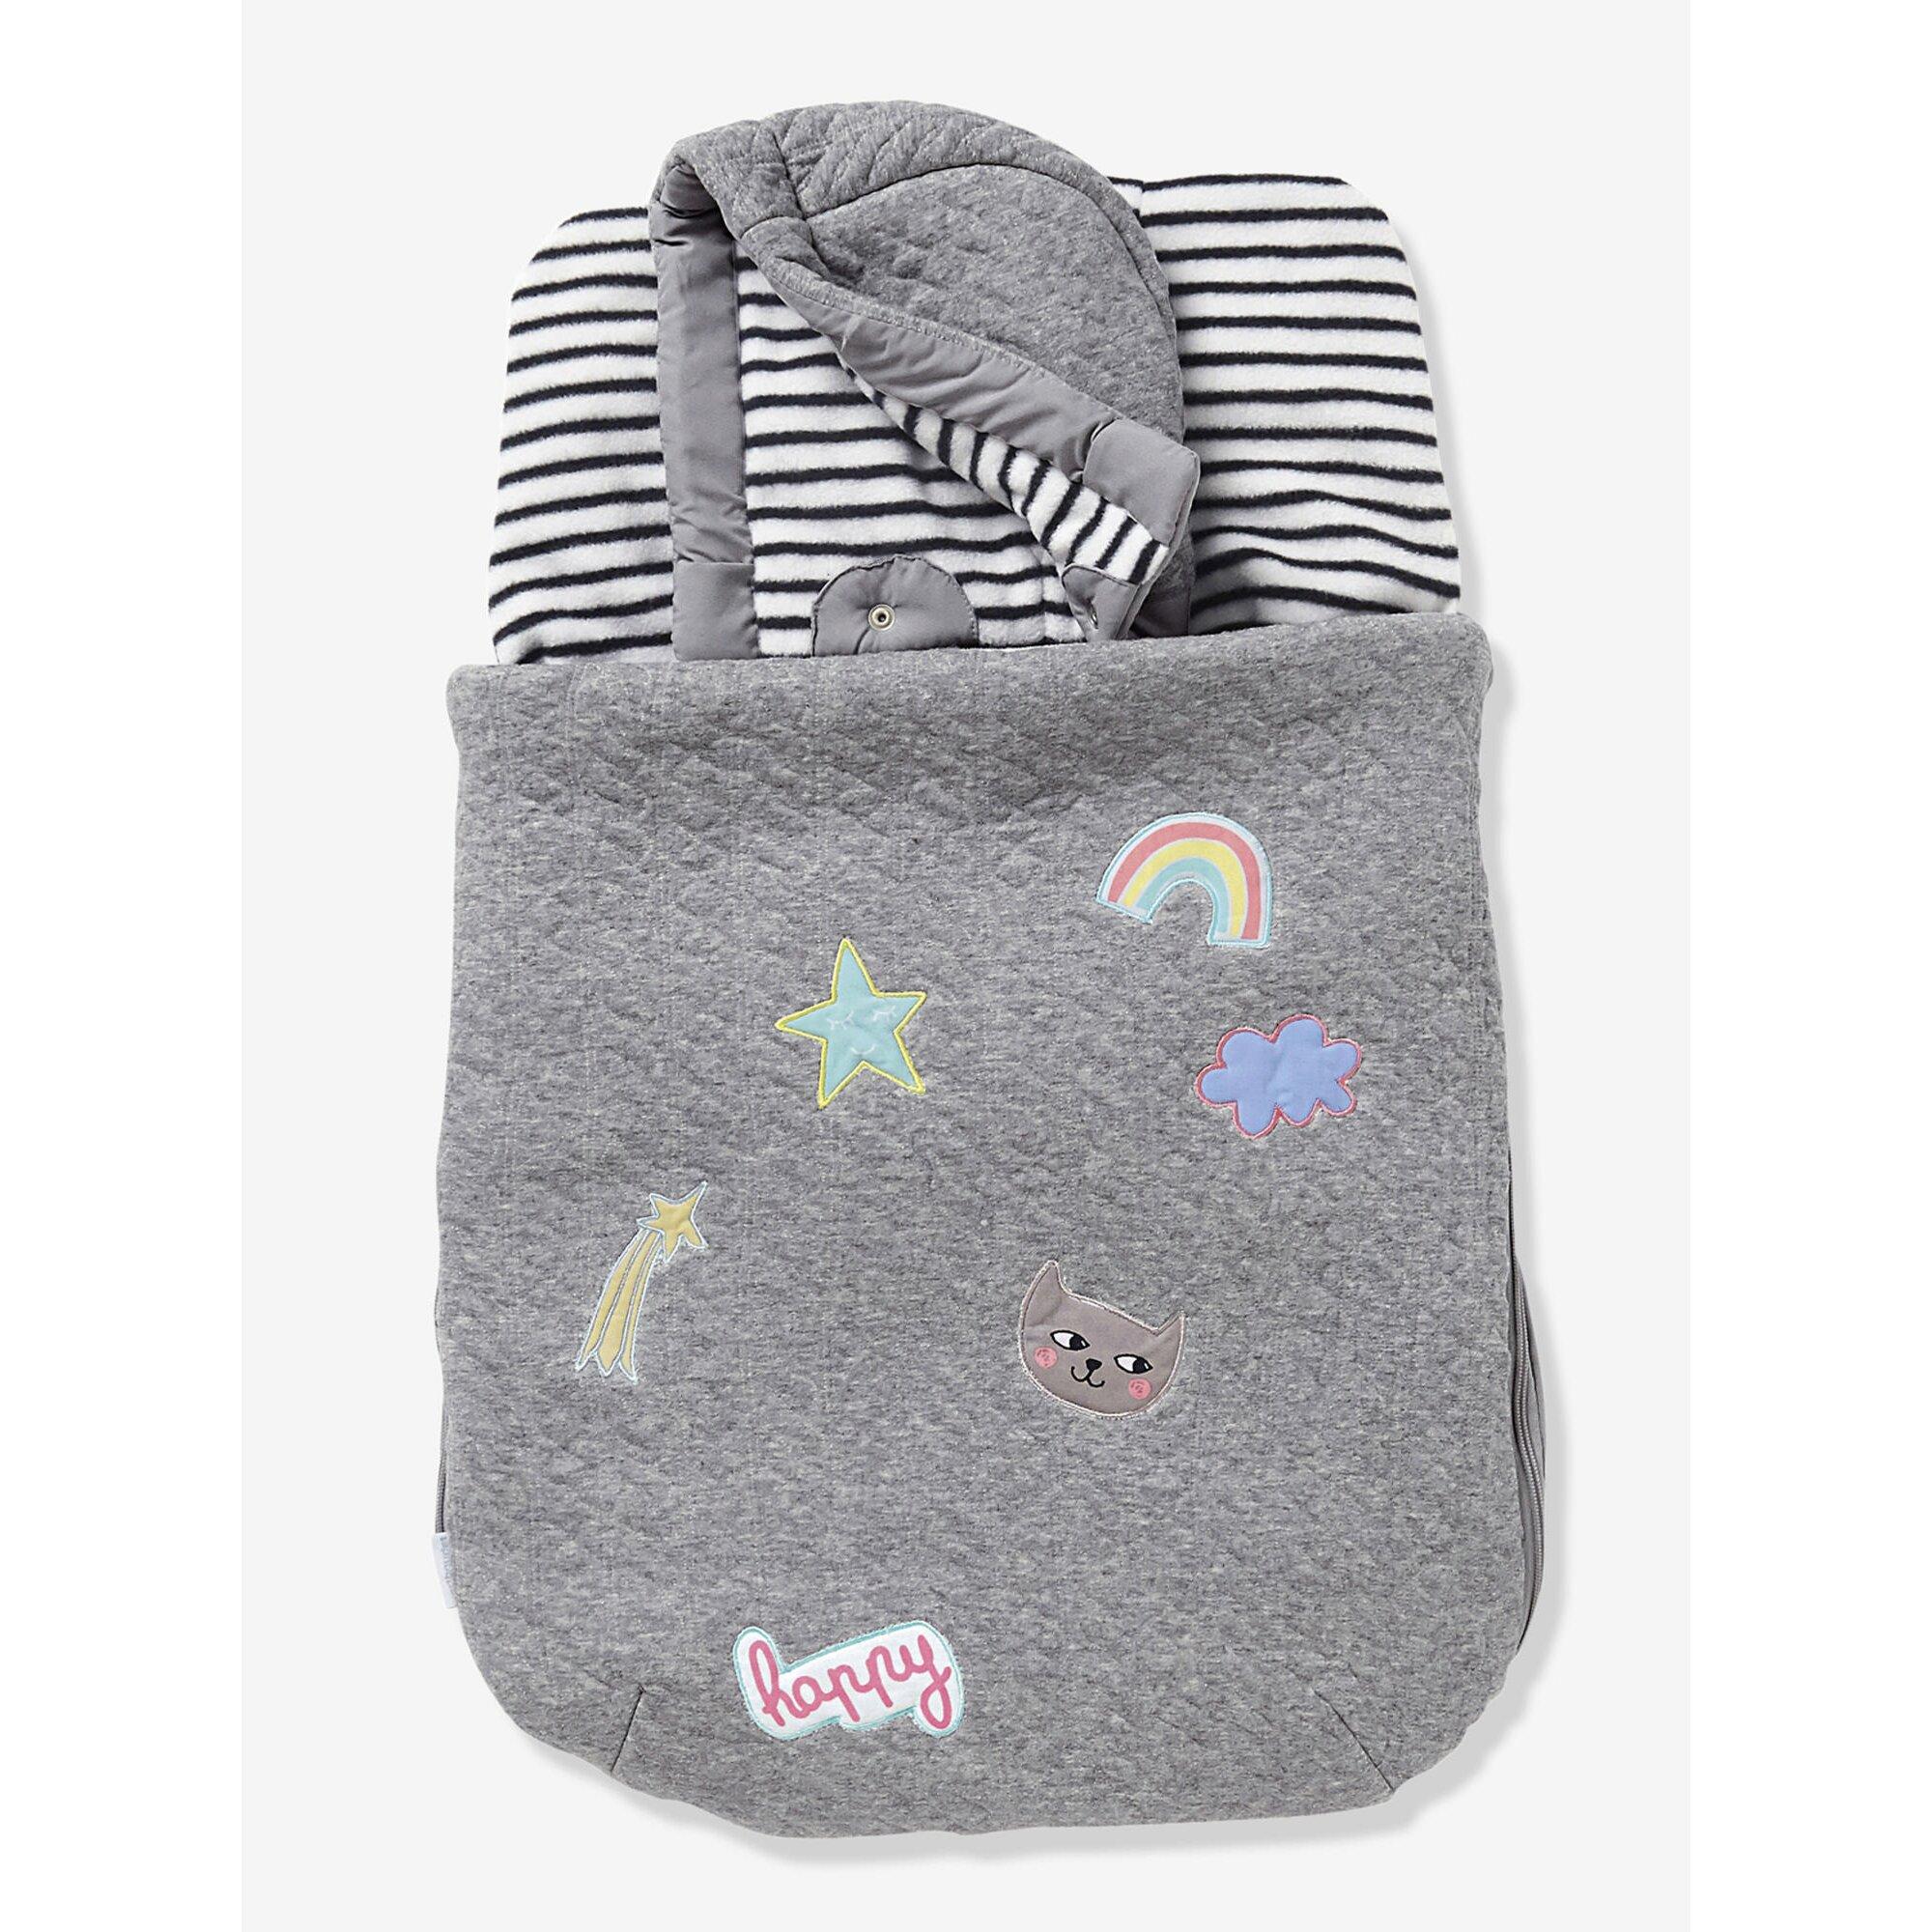 vertbaudet-fu-sack-fur-babyschale-fleecefutter-grau, 40.99 EUR @ babywalz-de